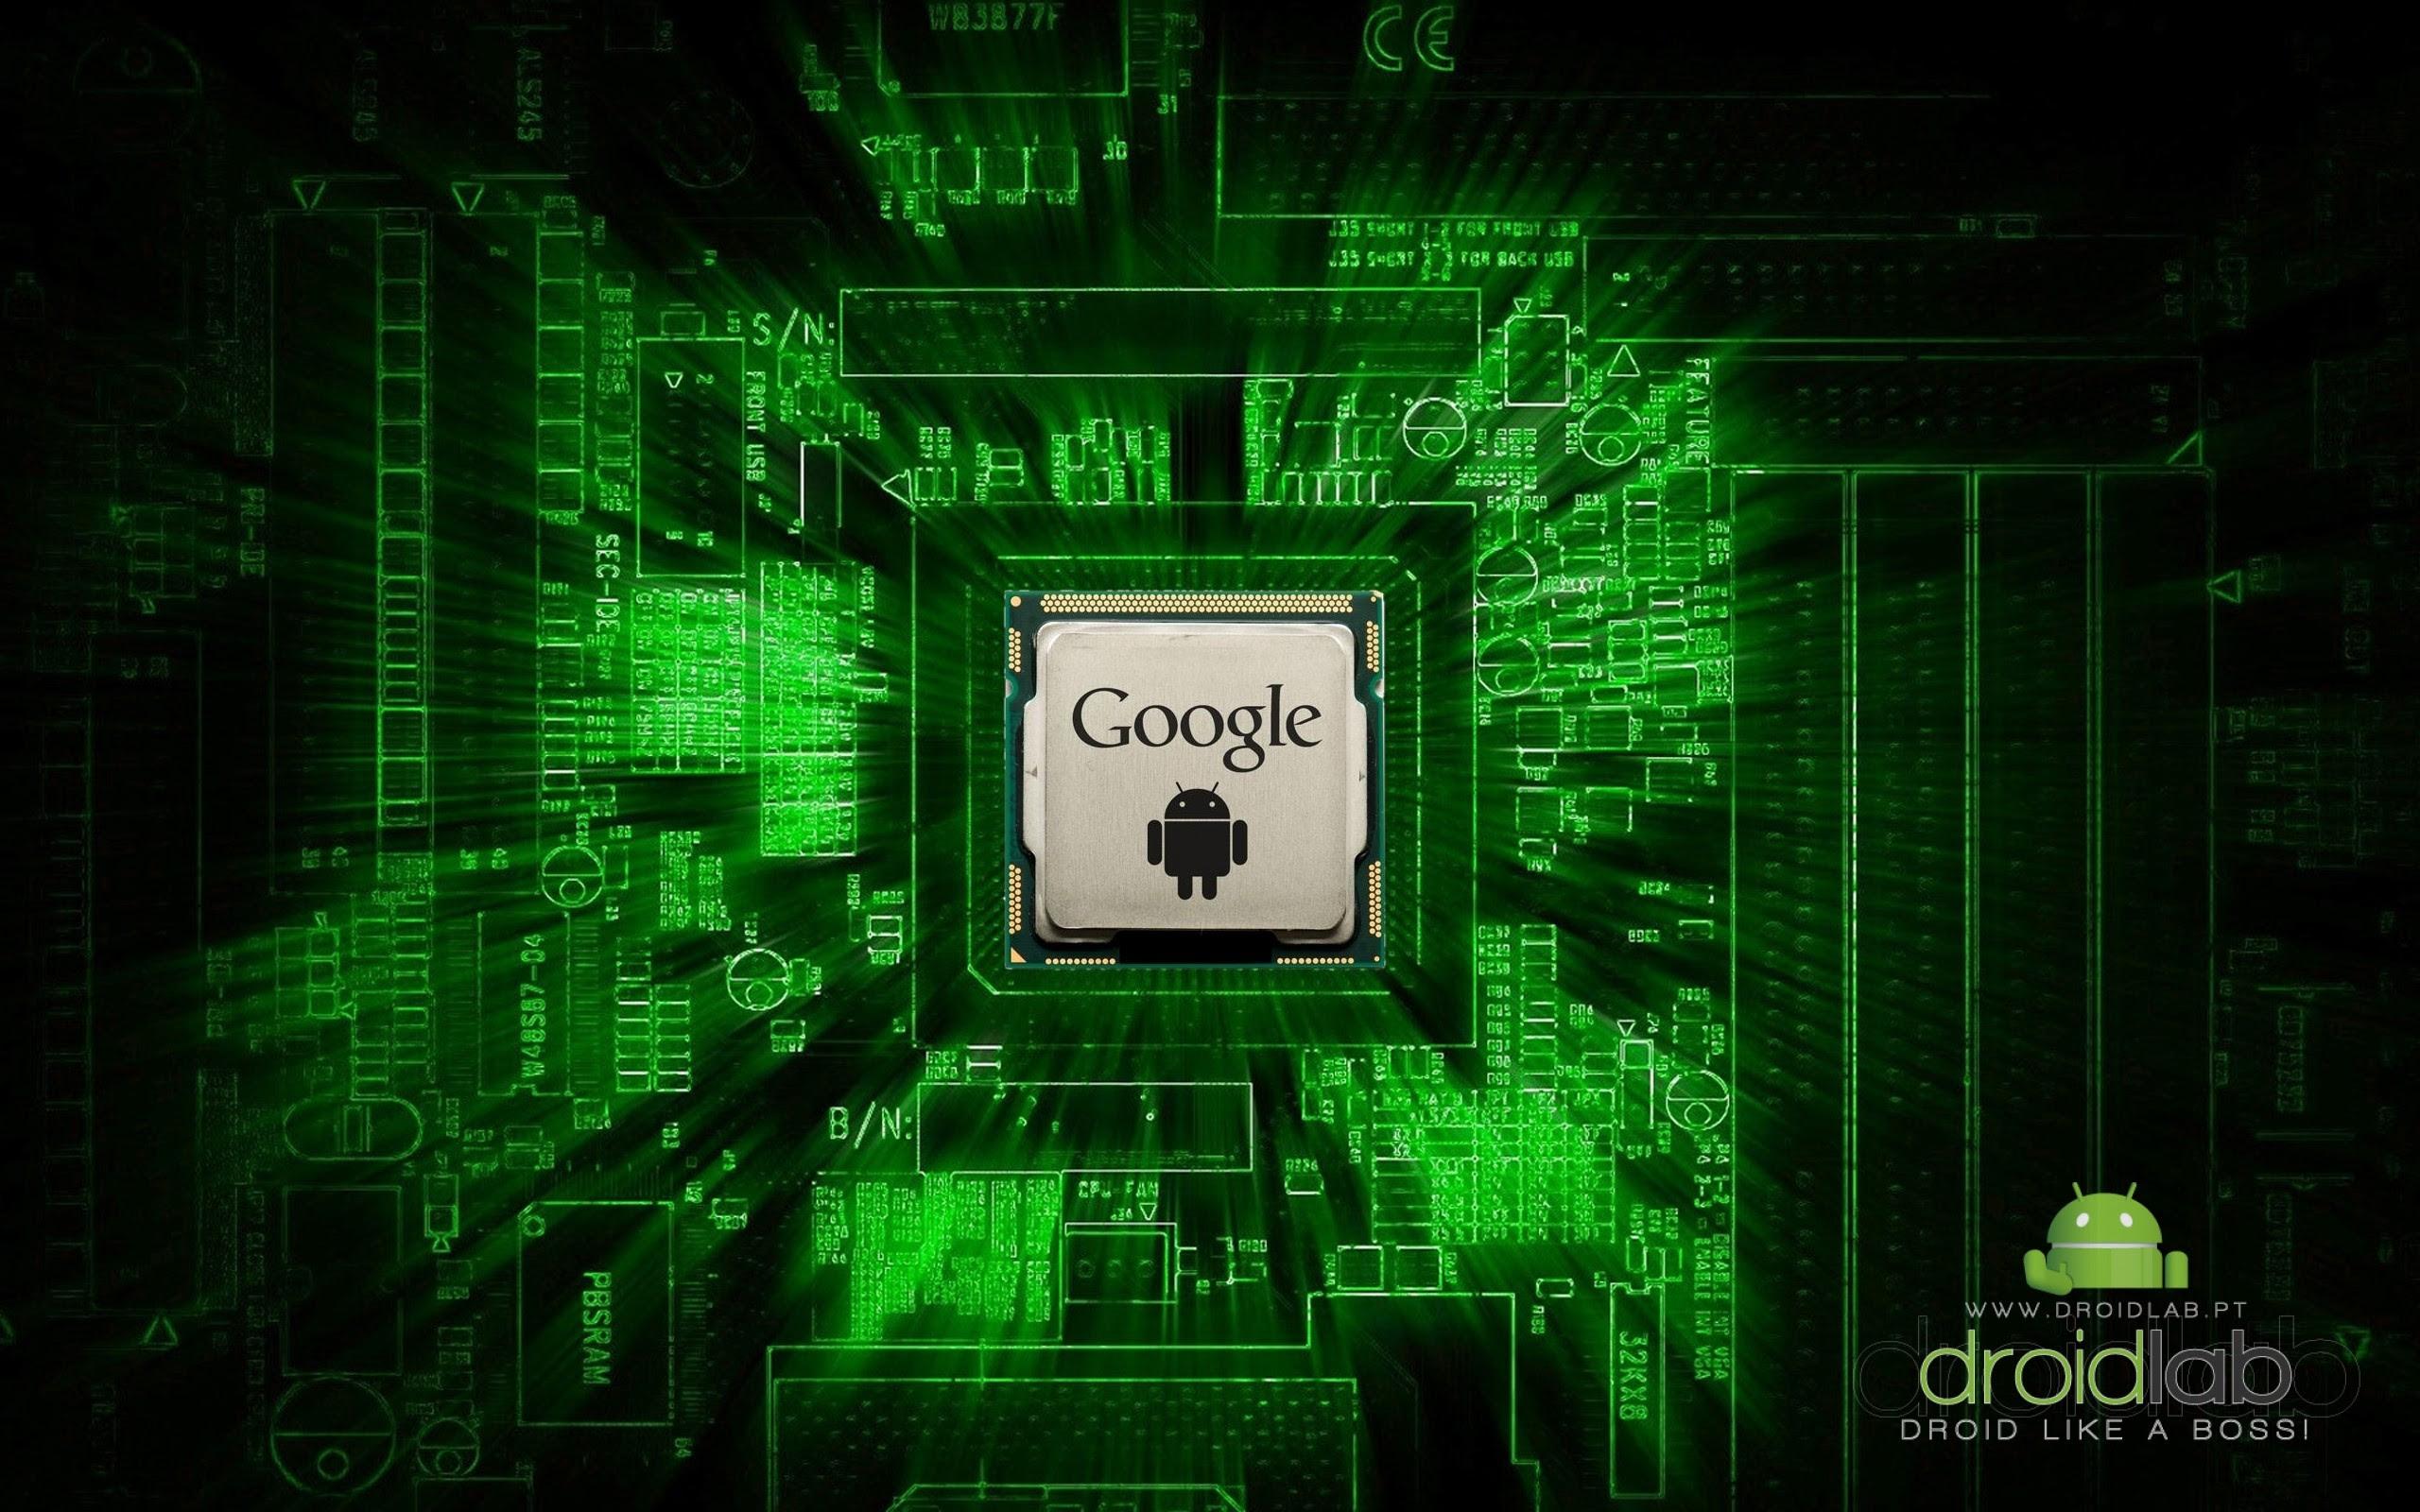 Unduh 4000+ Wallpaper Android Robot HD Terbaru